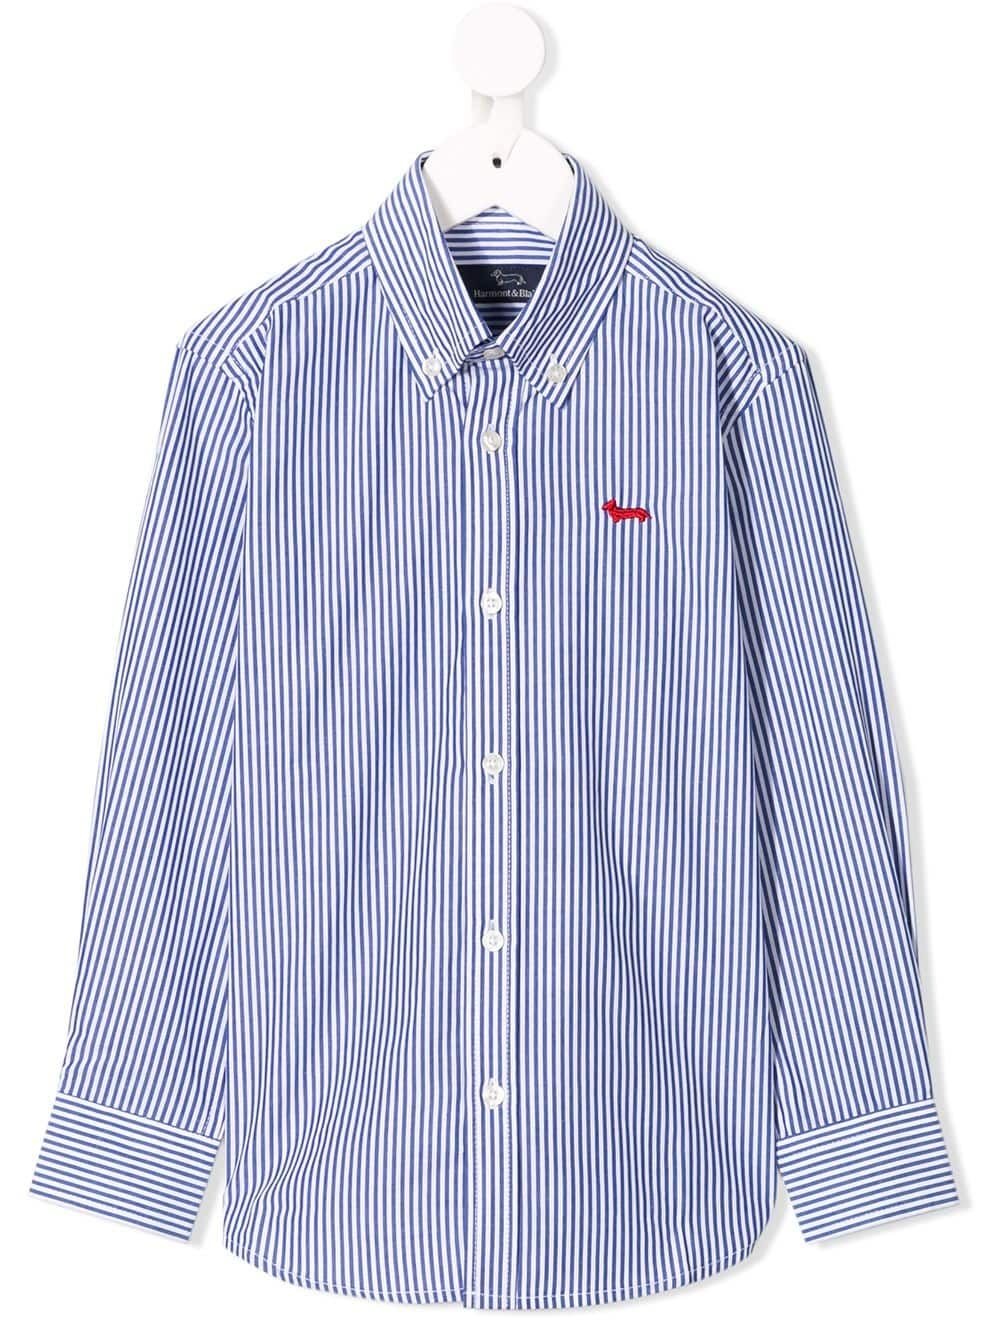 Harmont & Blaine Junior striped shirt - Blue   Striped shirt, Blue striped  shirt, Ralph lauren kids